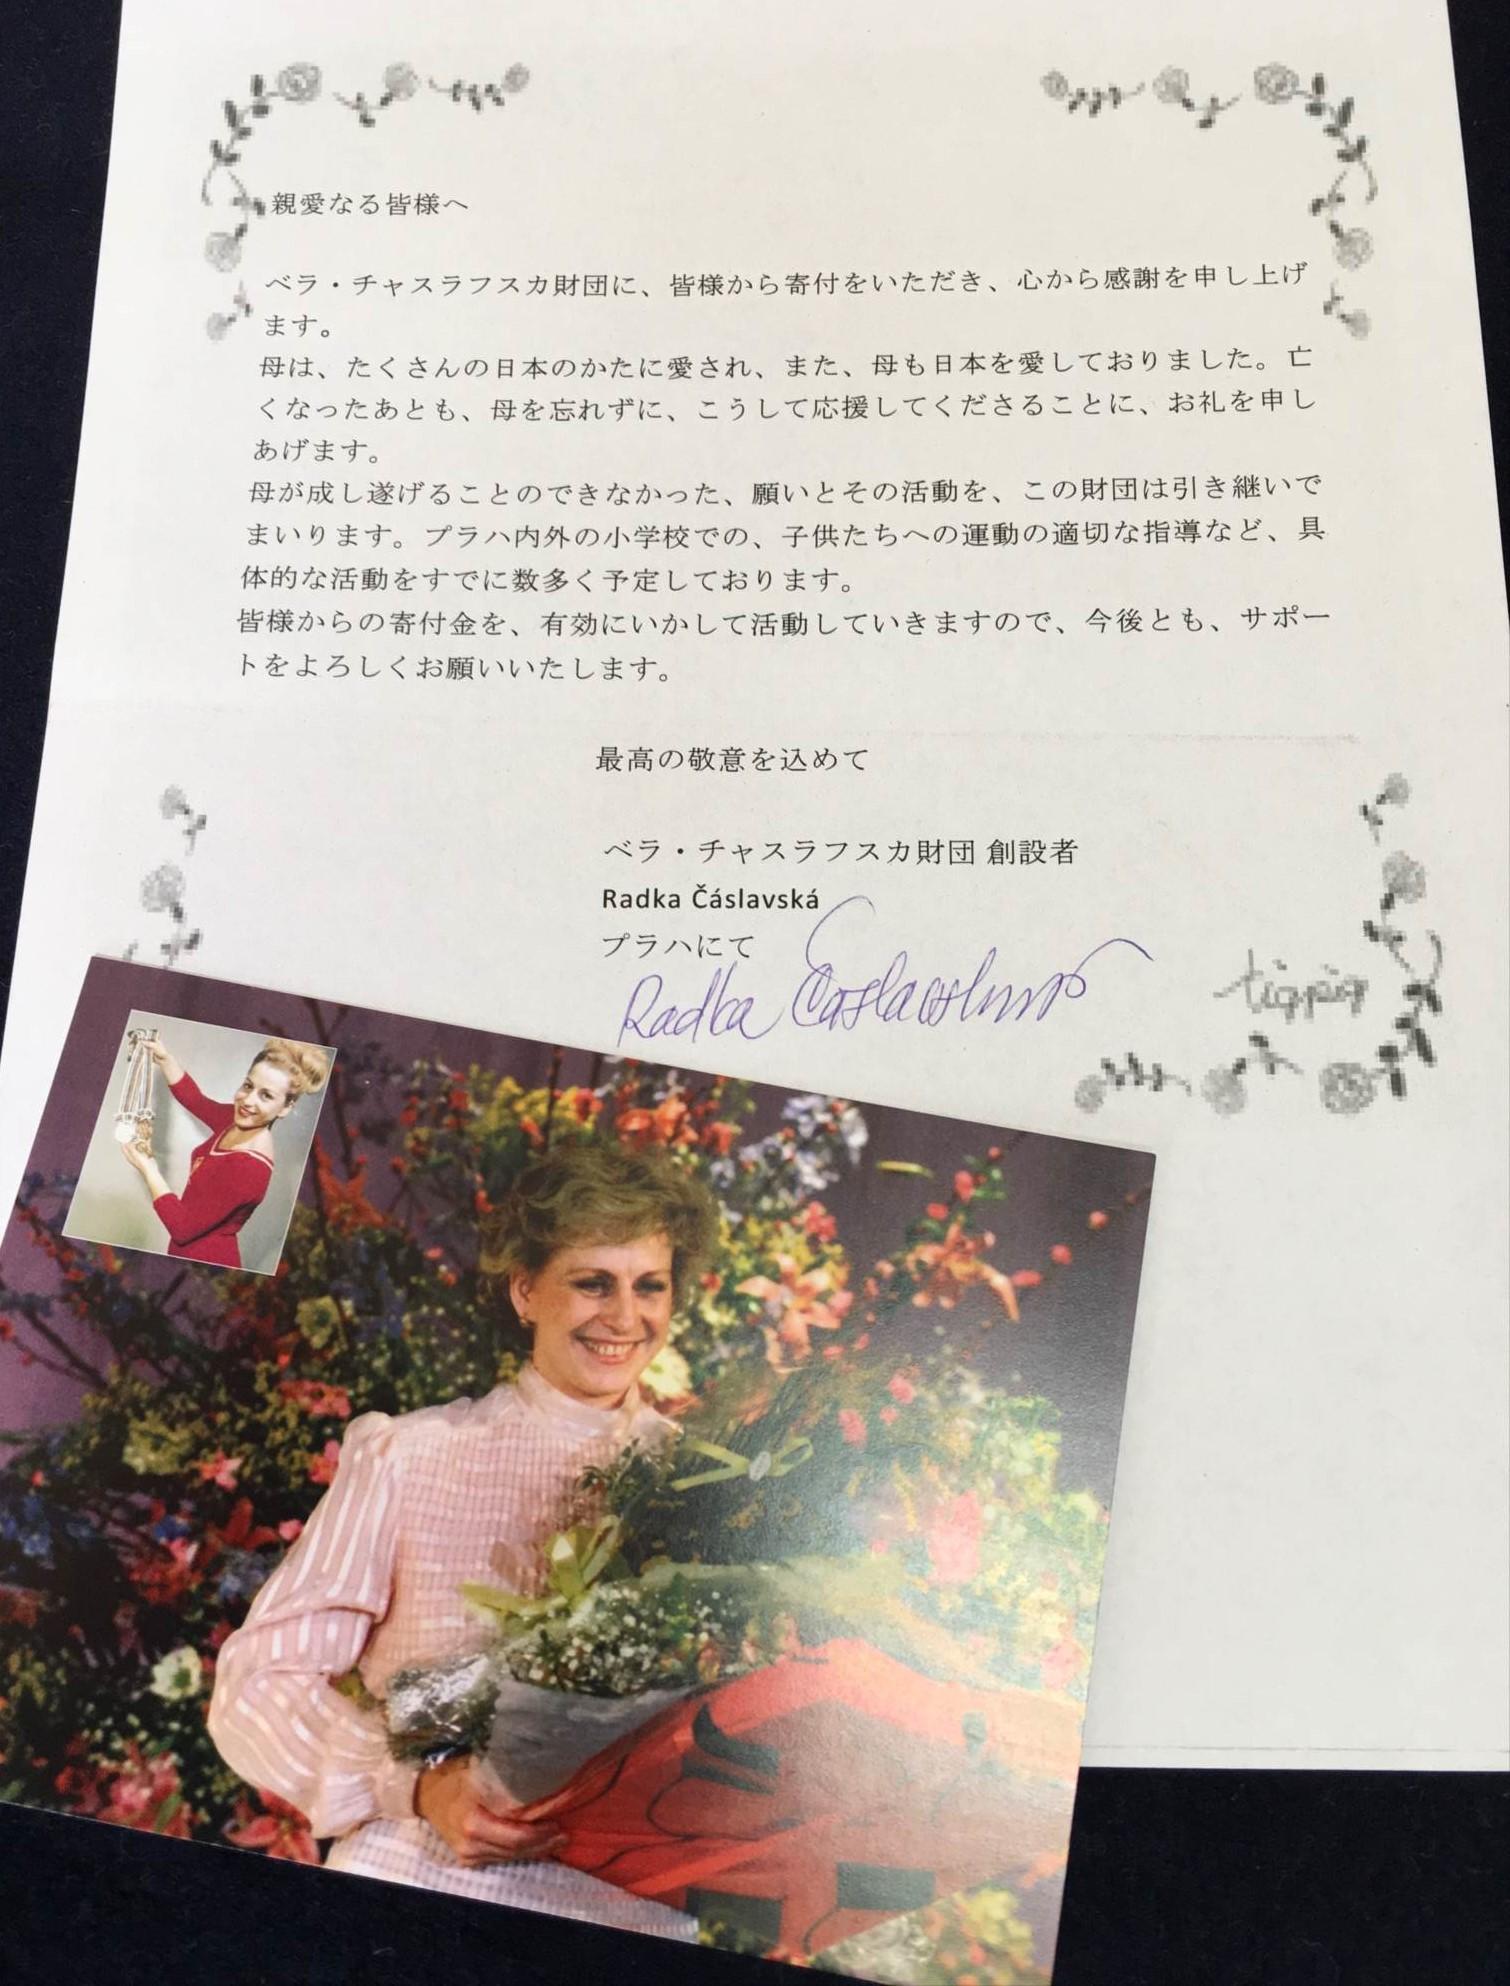 http://rieko-sugihara.com/information/item/IMG_8241_R.JPG